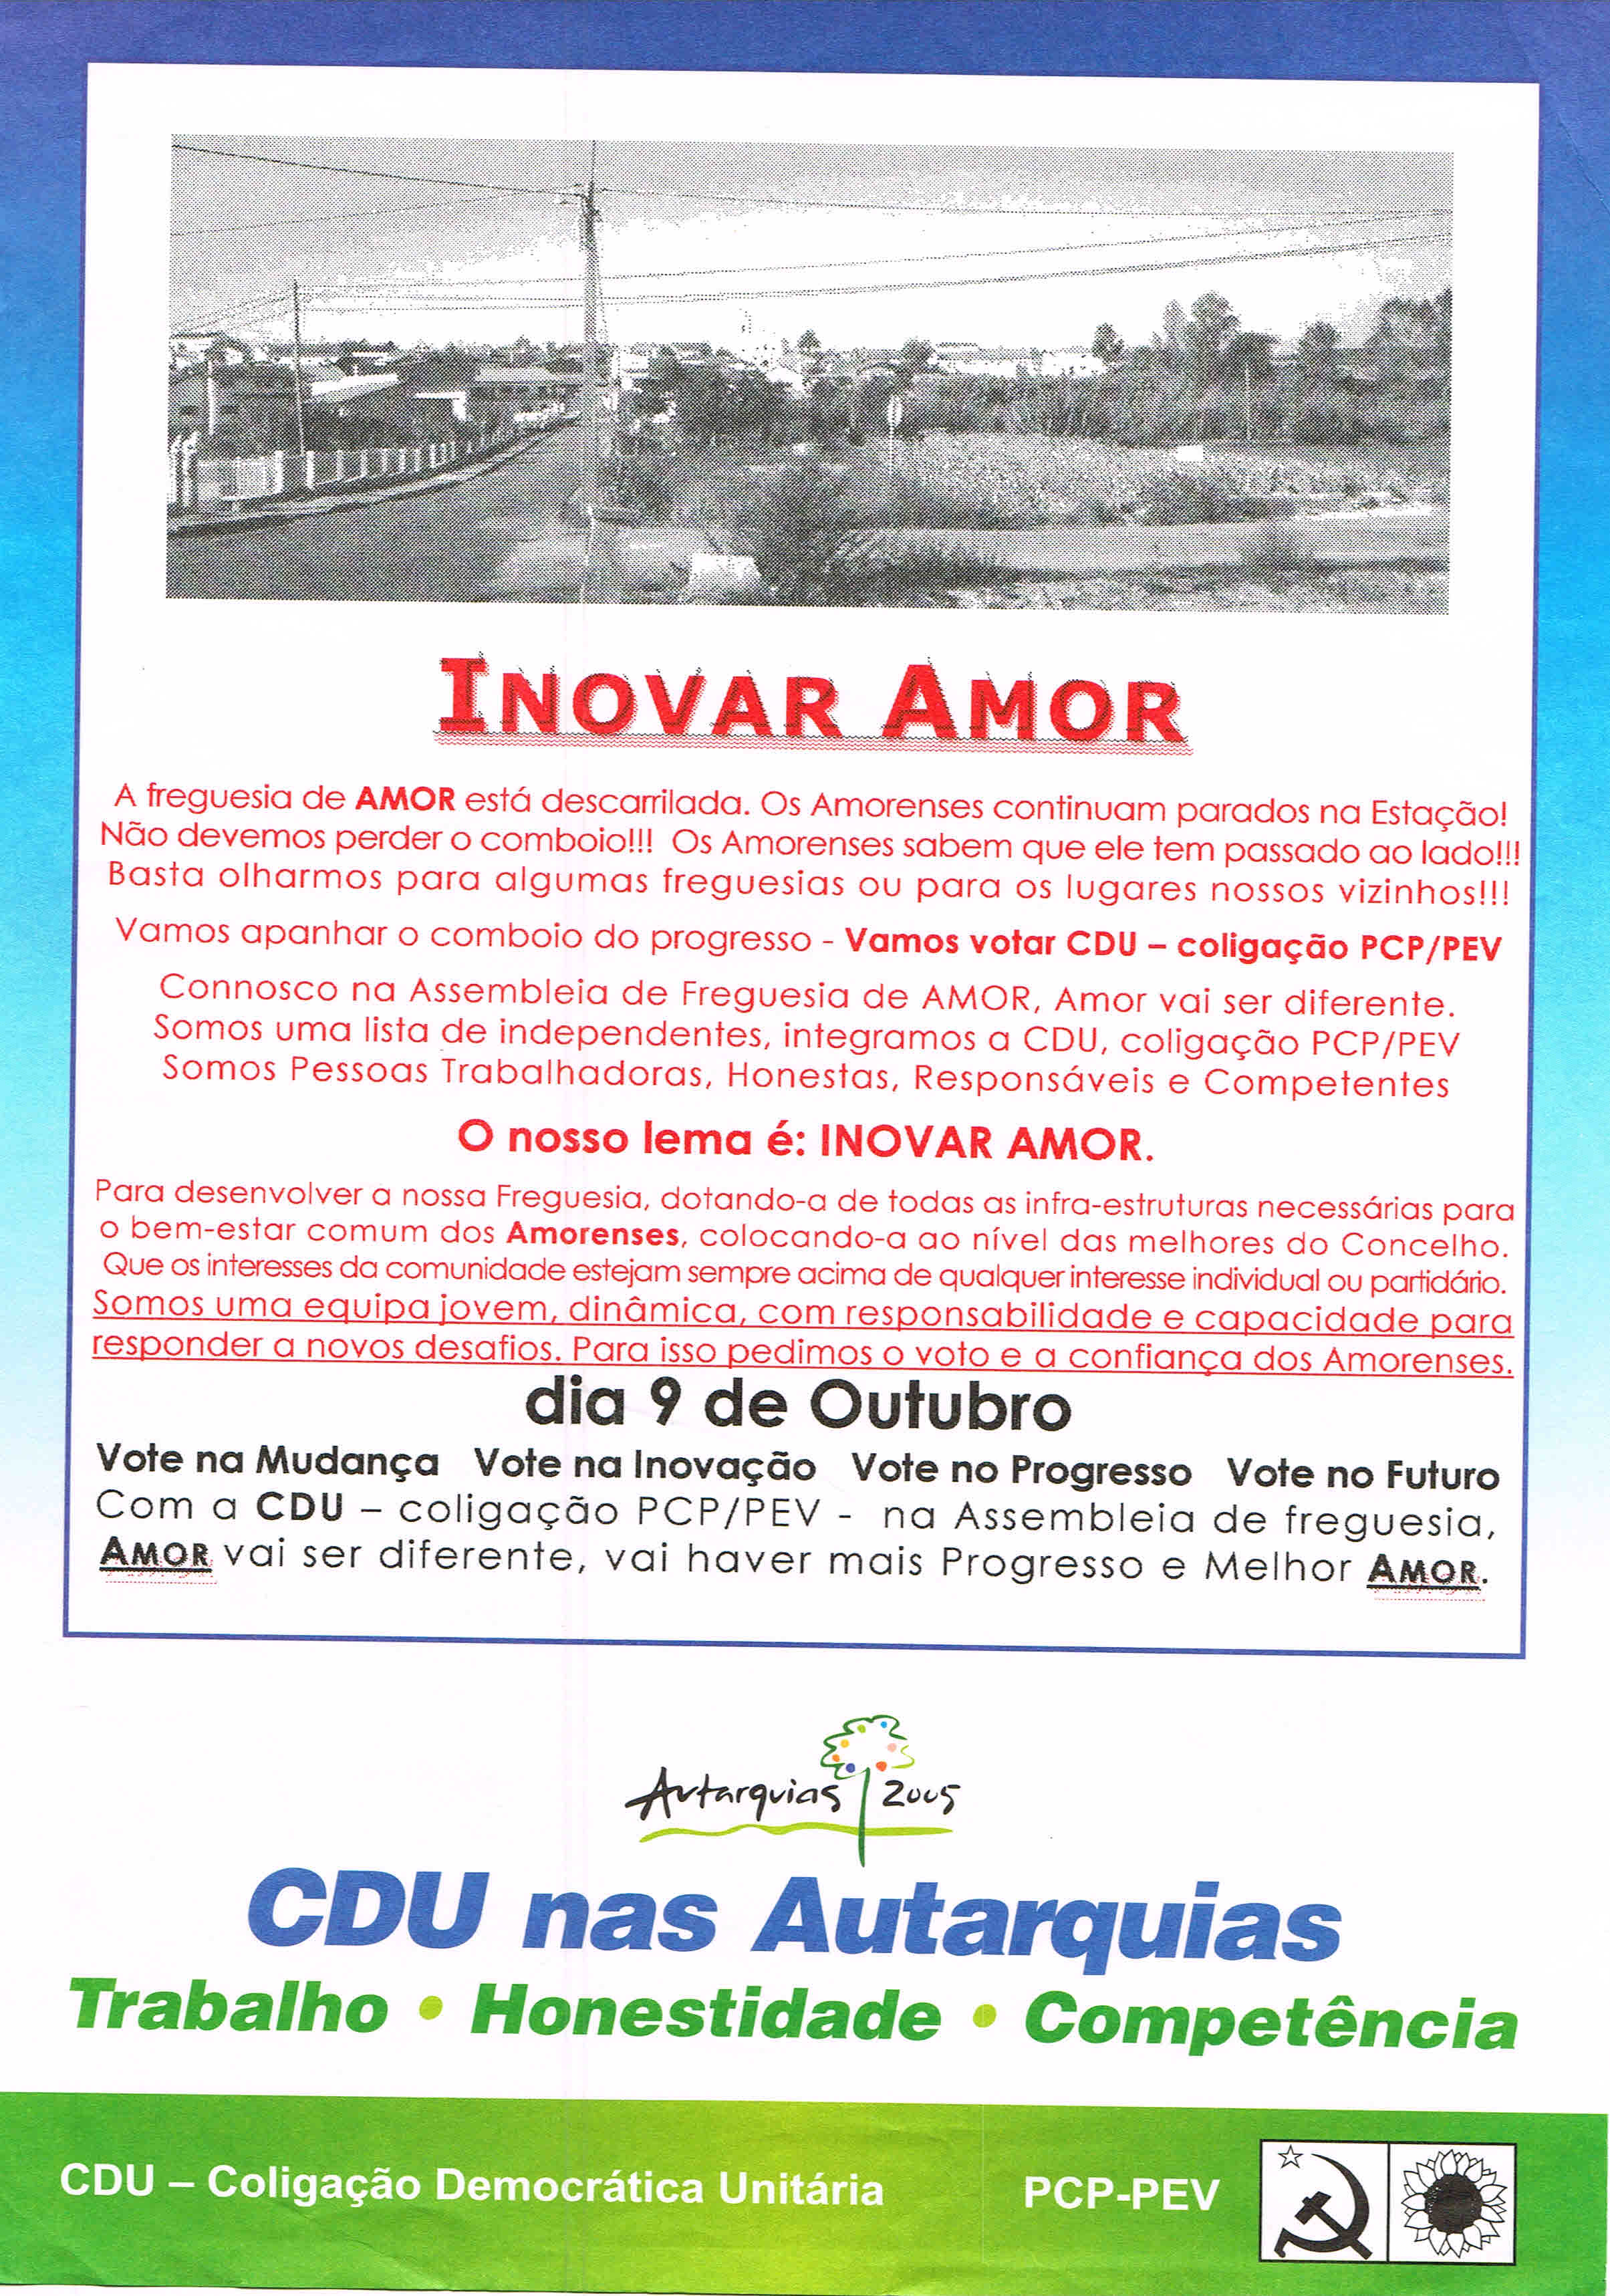 CCF24042019_0009 (2)